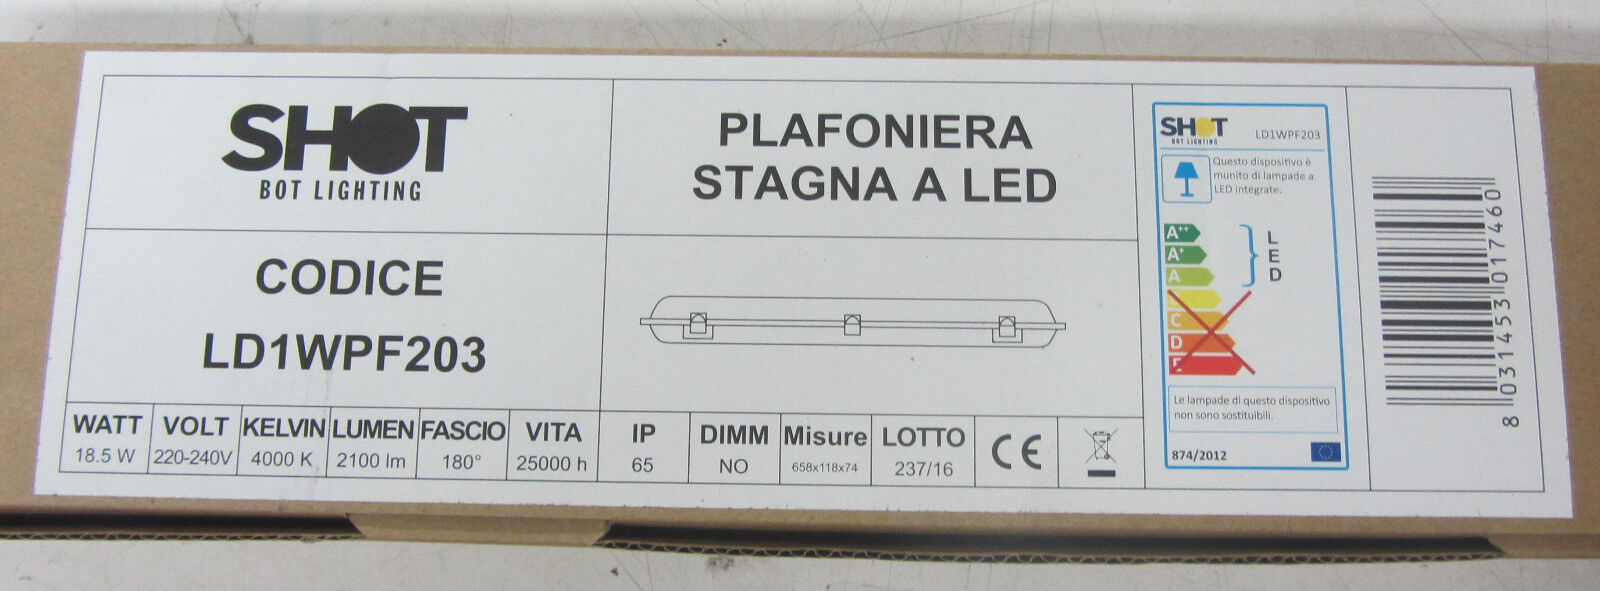 SHOT BOT LIGHTING LIGHTING LIGHTING PLAFONIERA STRAGNA A LED IP65 INTERNO ESTERNO 18.5W LUCI INCLU 1b49d2